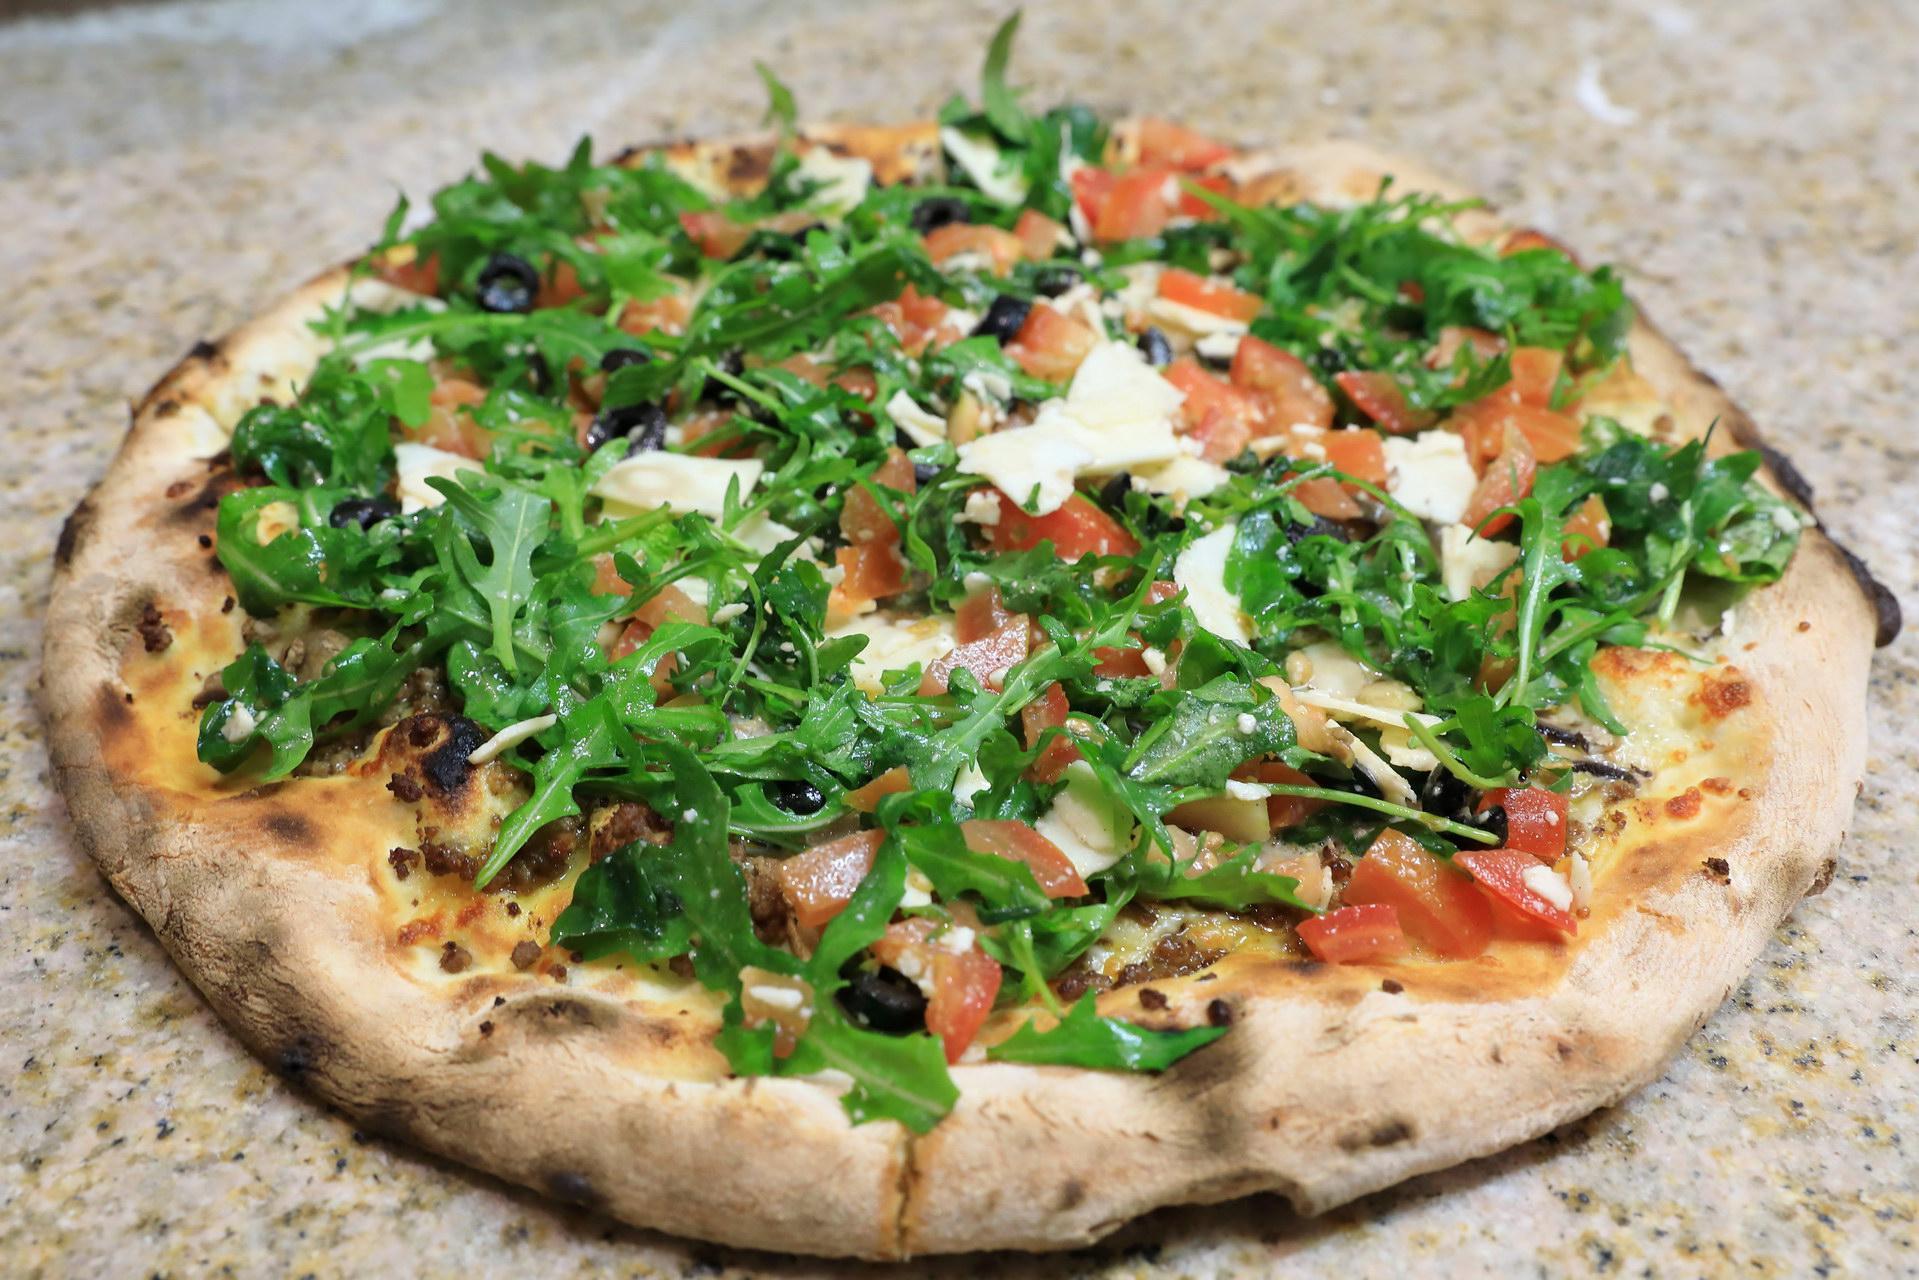 Le-Mediterraneen-Pizza-Braine-l-Alleud-0060.jpg